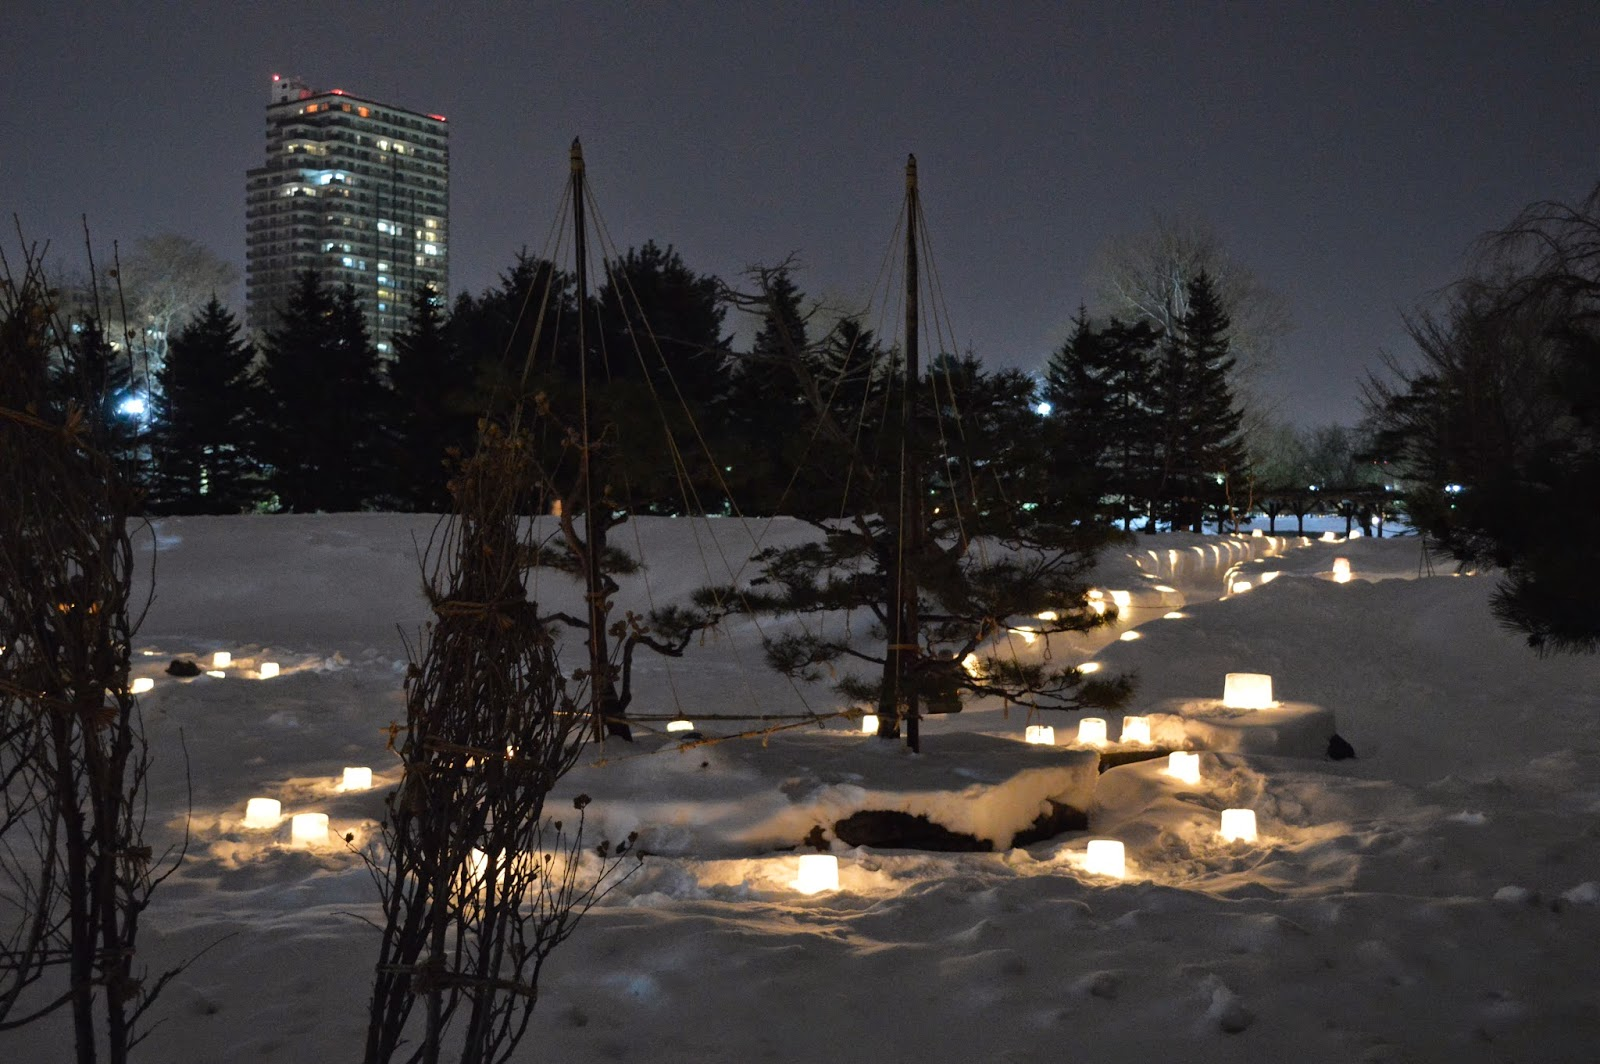 park winter night